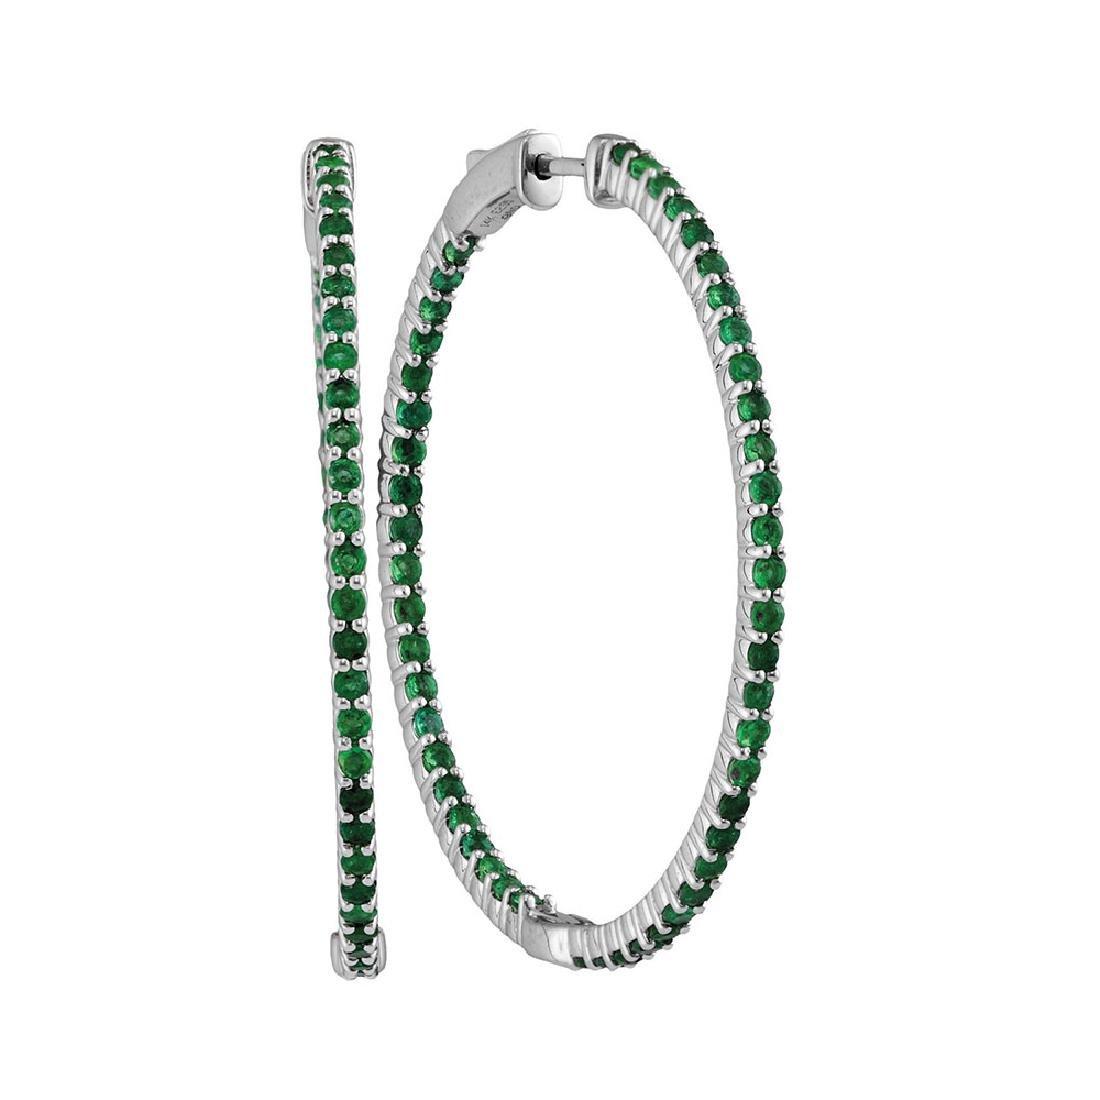 3 CTW Emerald Hoop Earrings 14KT White Gold -